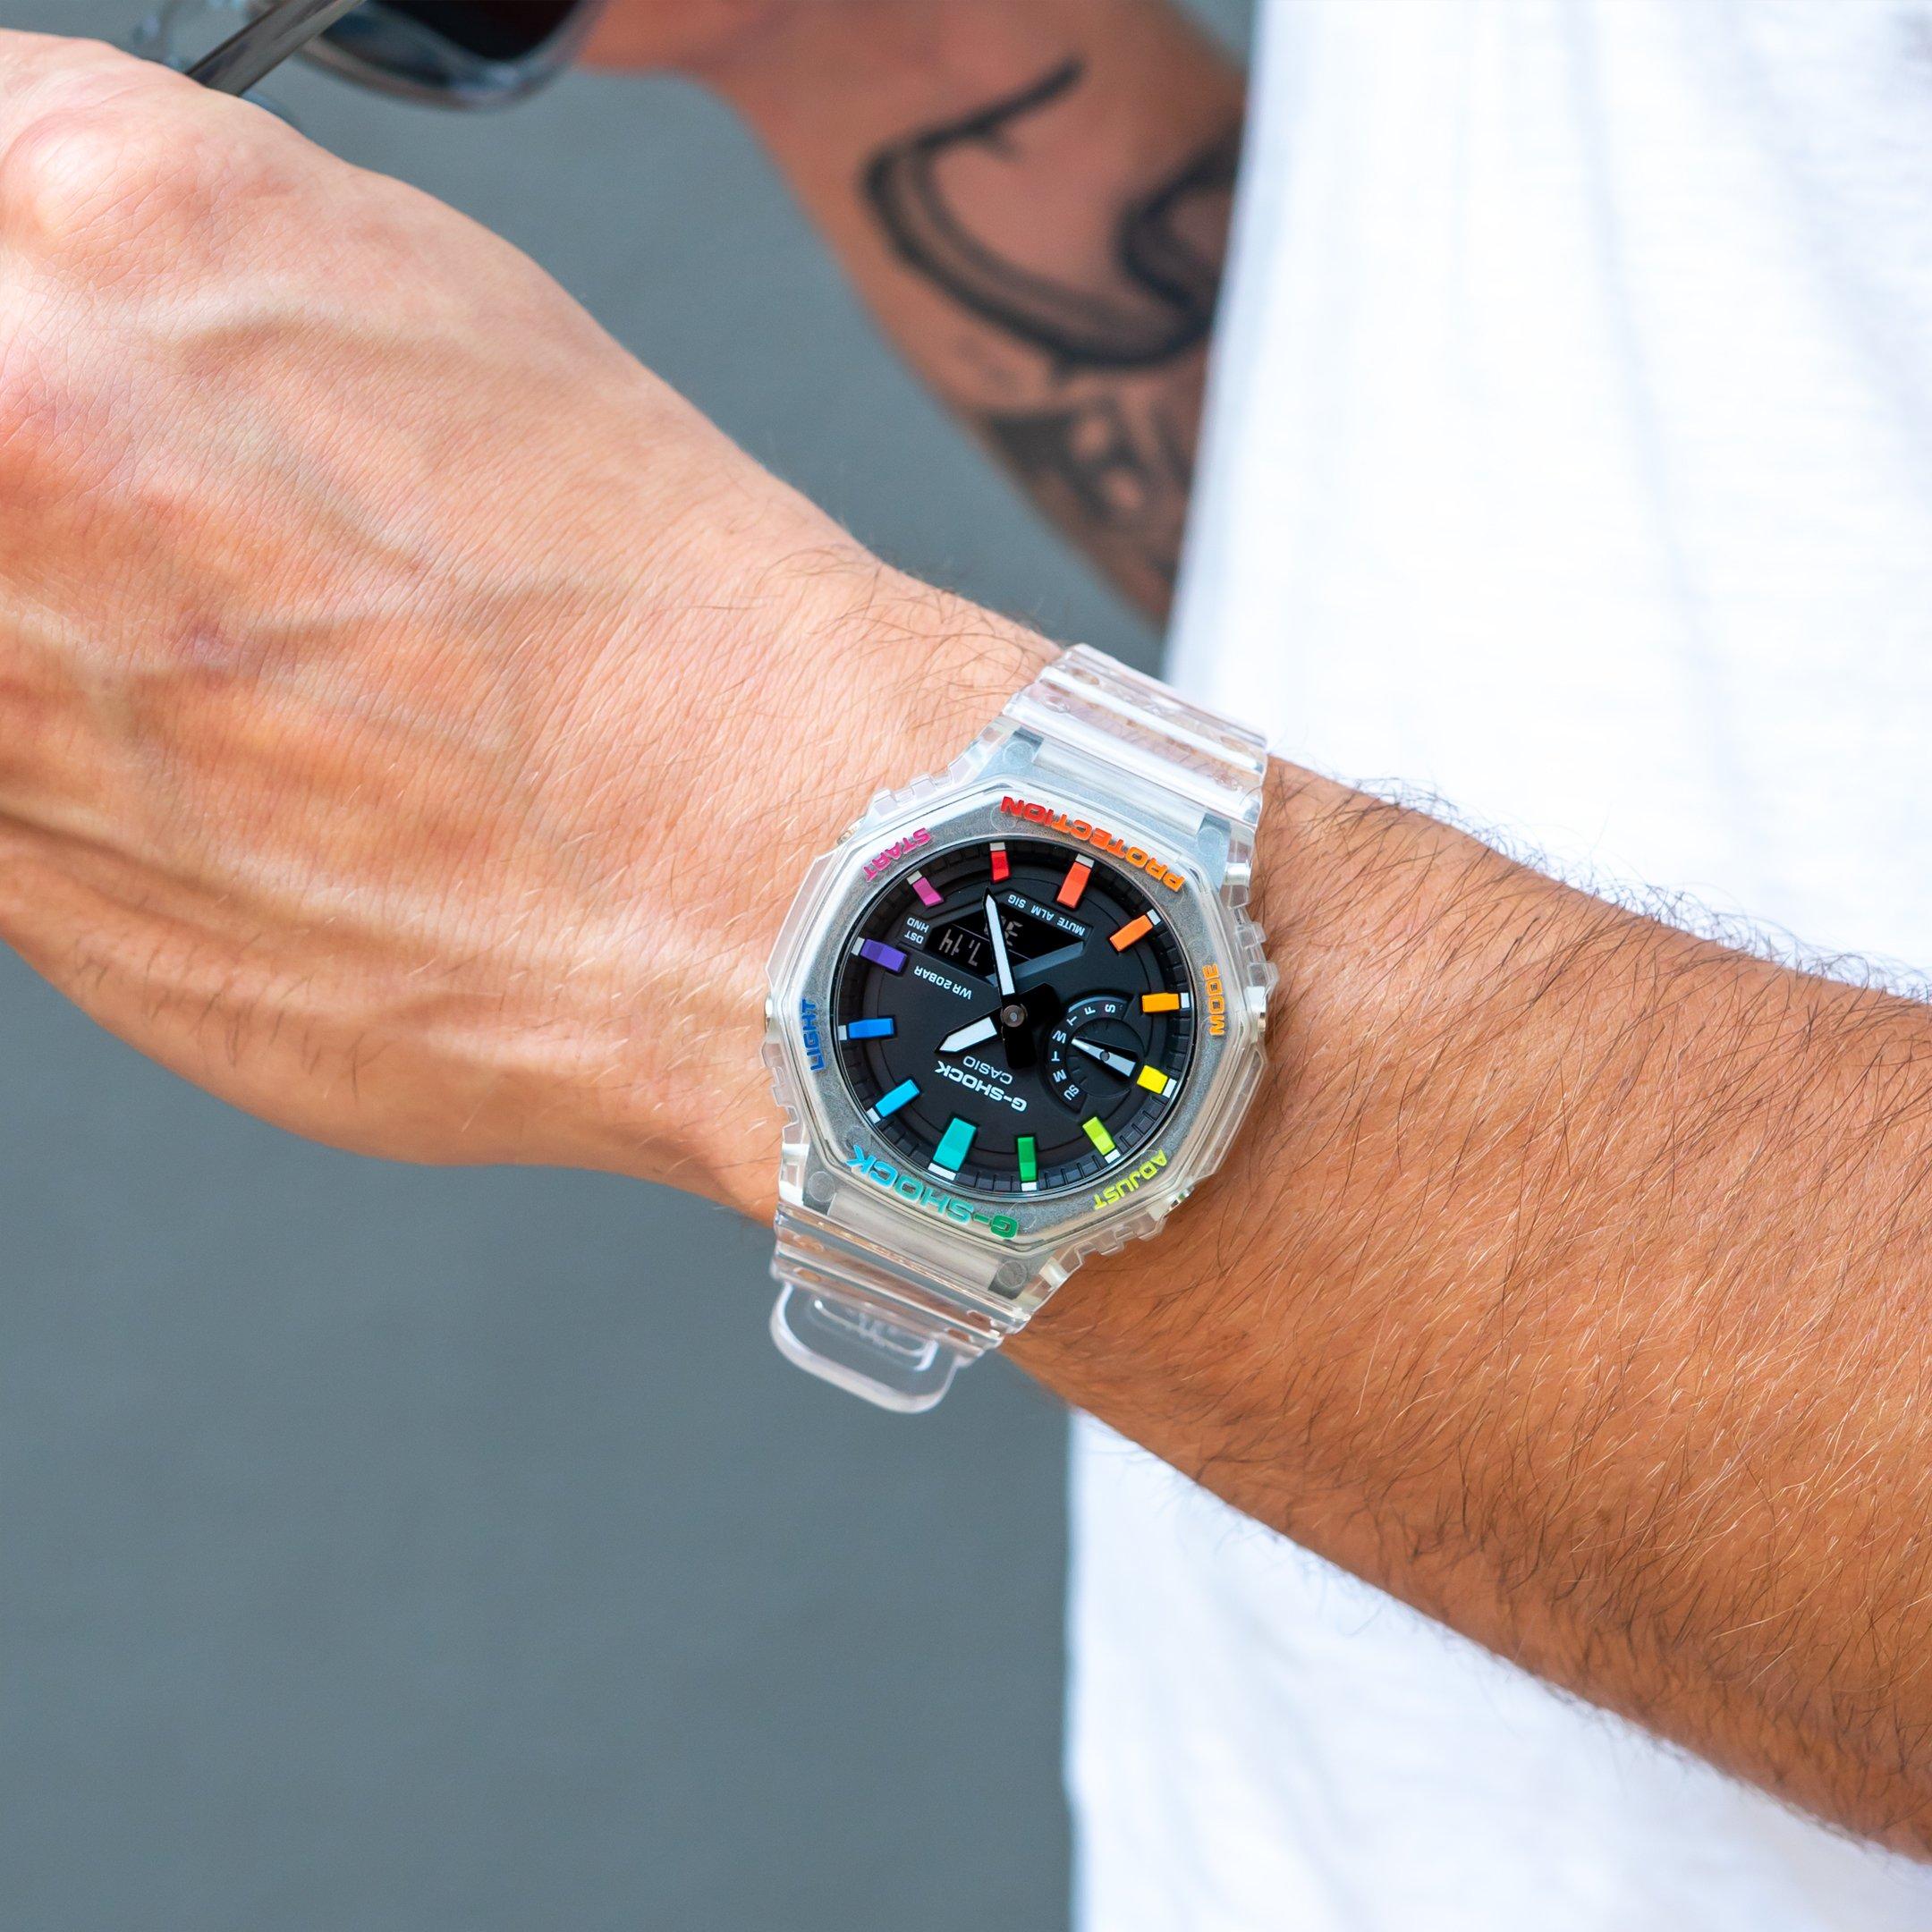 IFLW G-Shock GA-2100SKE-7AER CasiOak Jellyfish Rainbow watch hand-painted by the Dial Artist